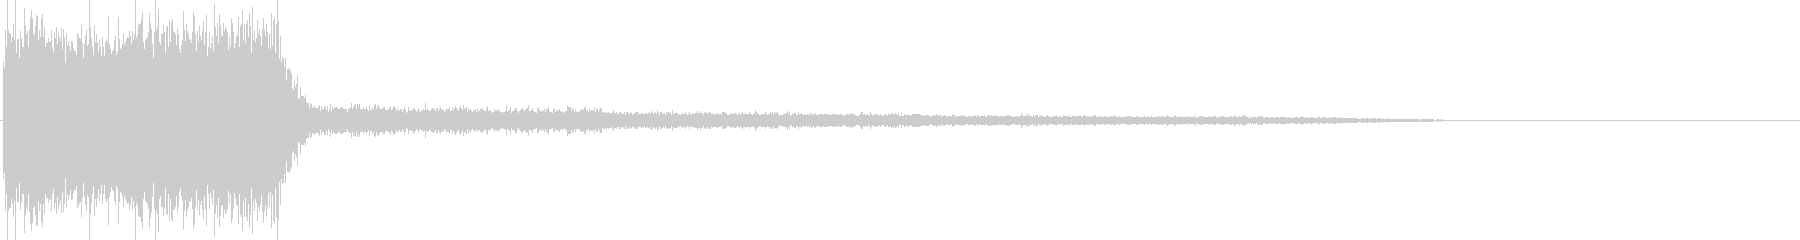 chance sound, appearance, magic's unreproduced waveform